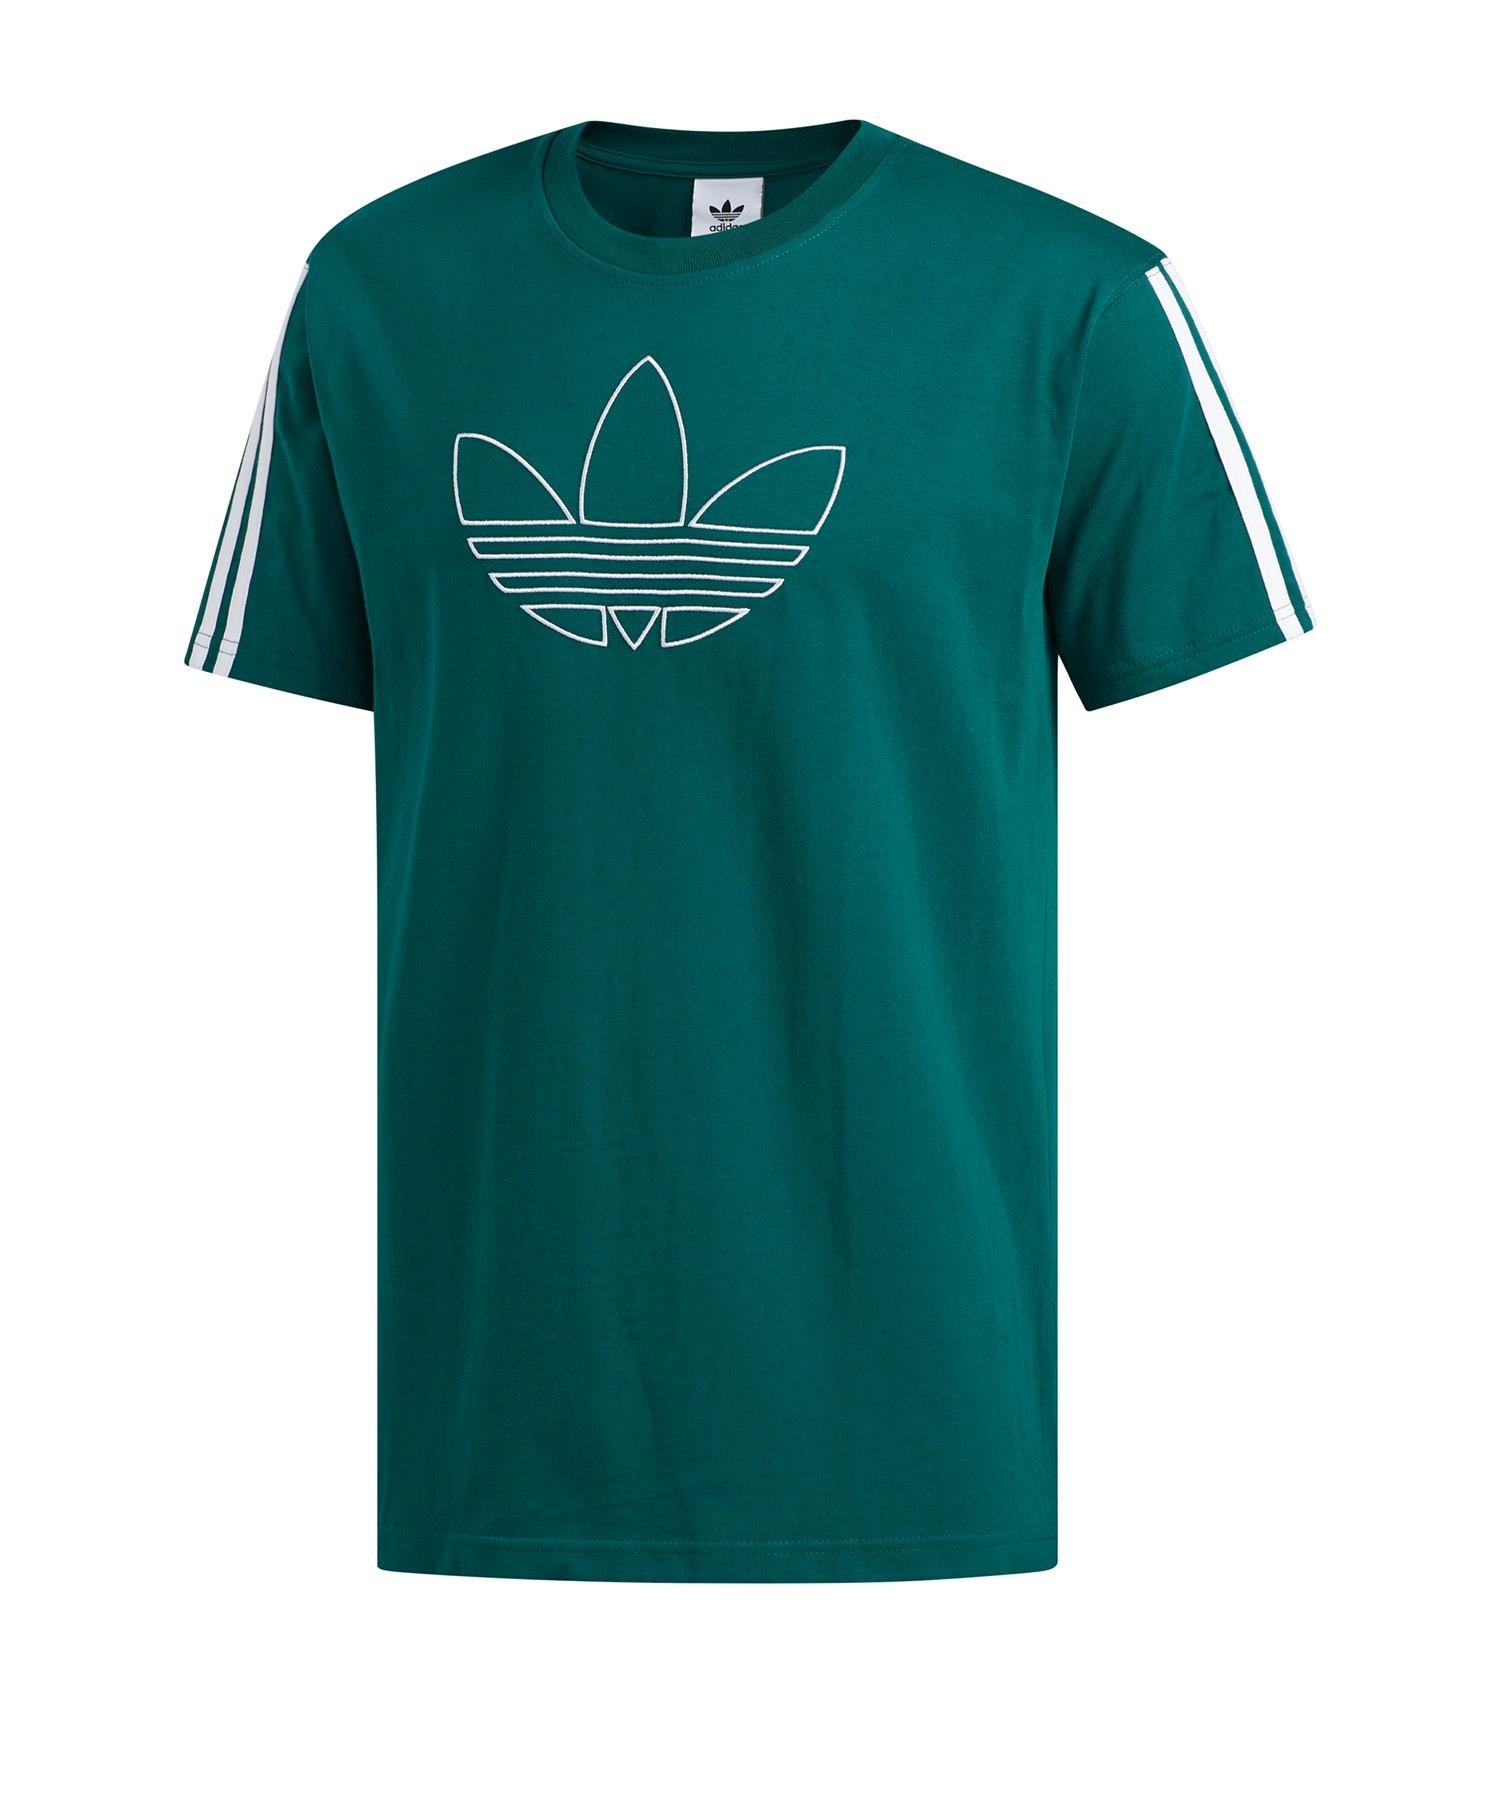 adidas Originals Trefoil T Shirt Grün